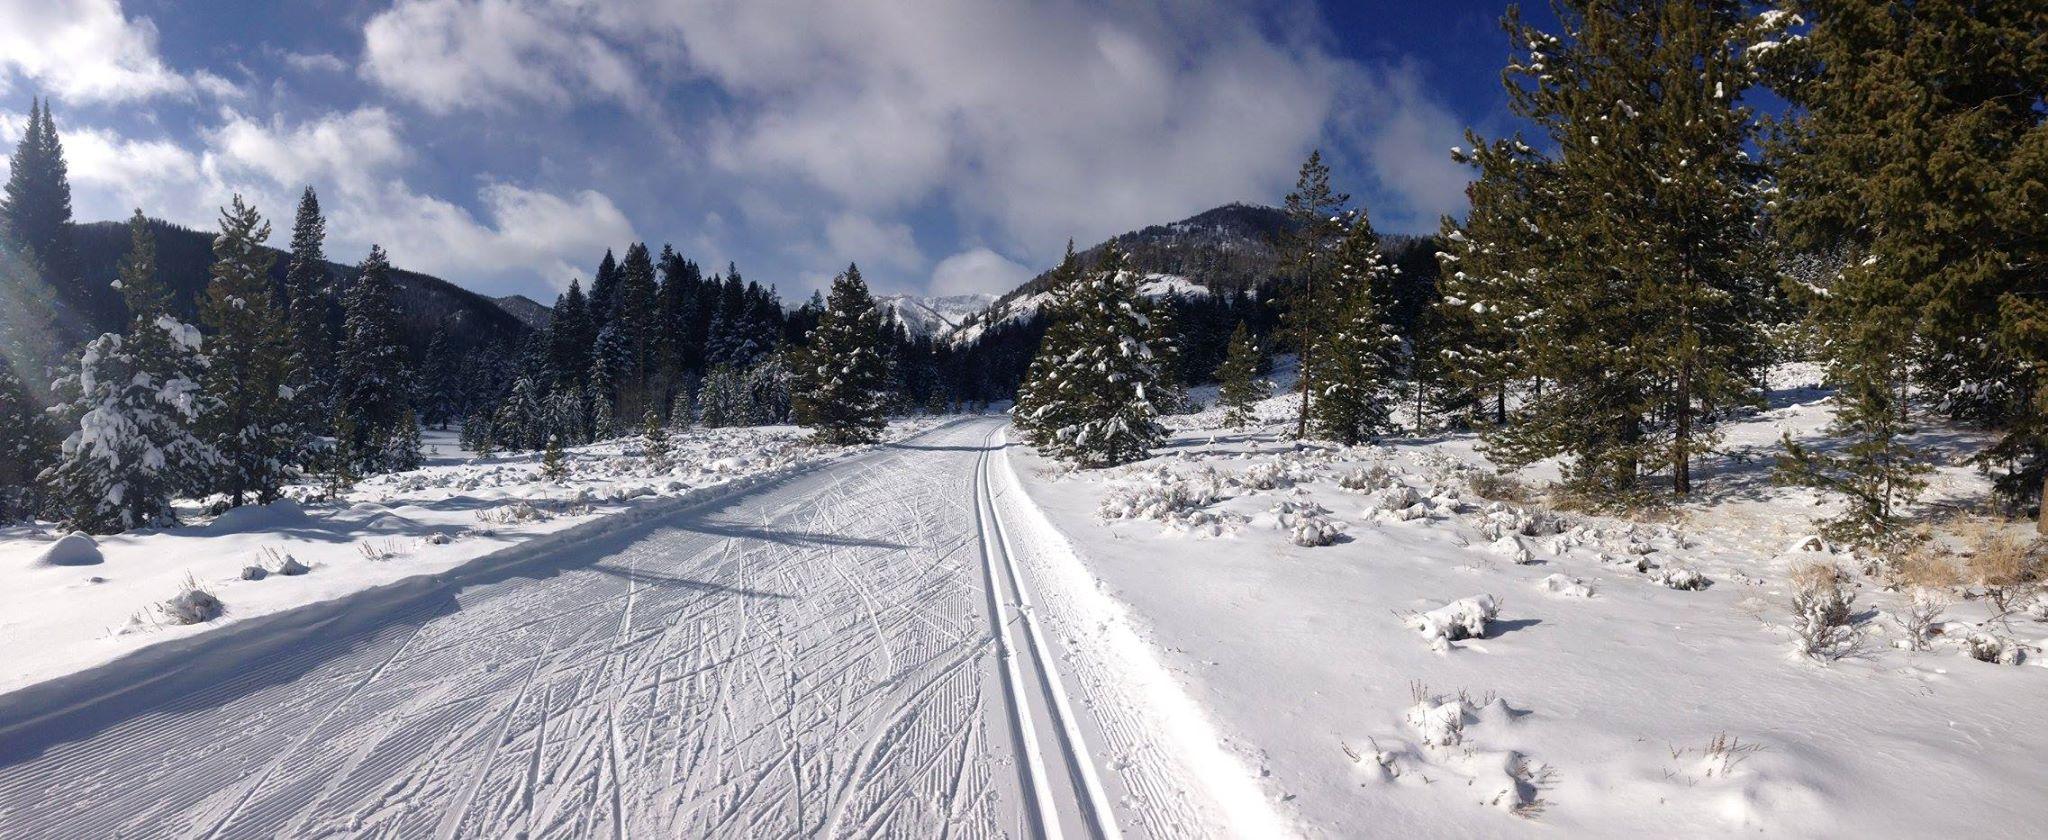 14 u.s. ski resorts with awesome cross country skiing